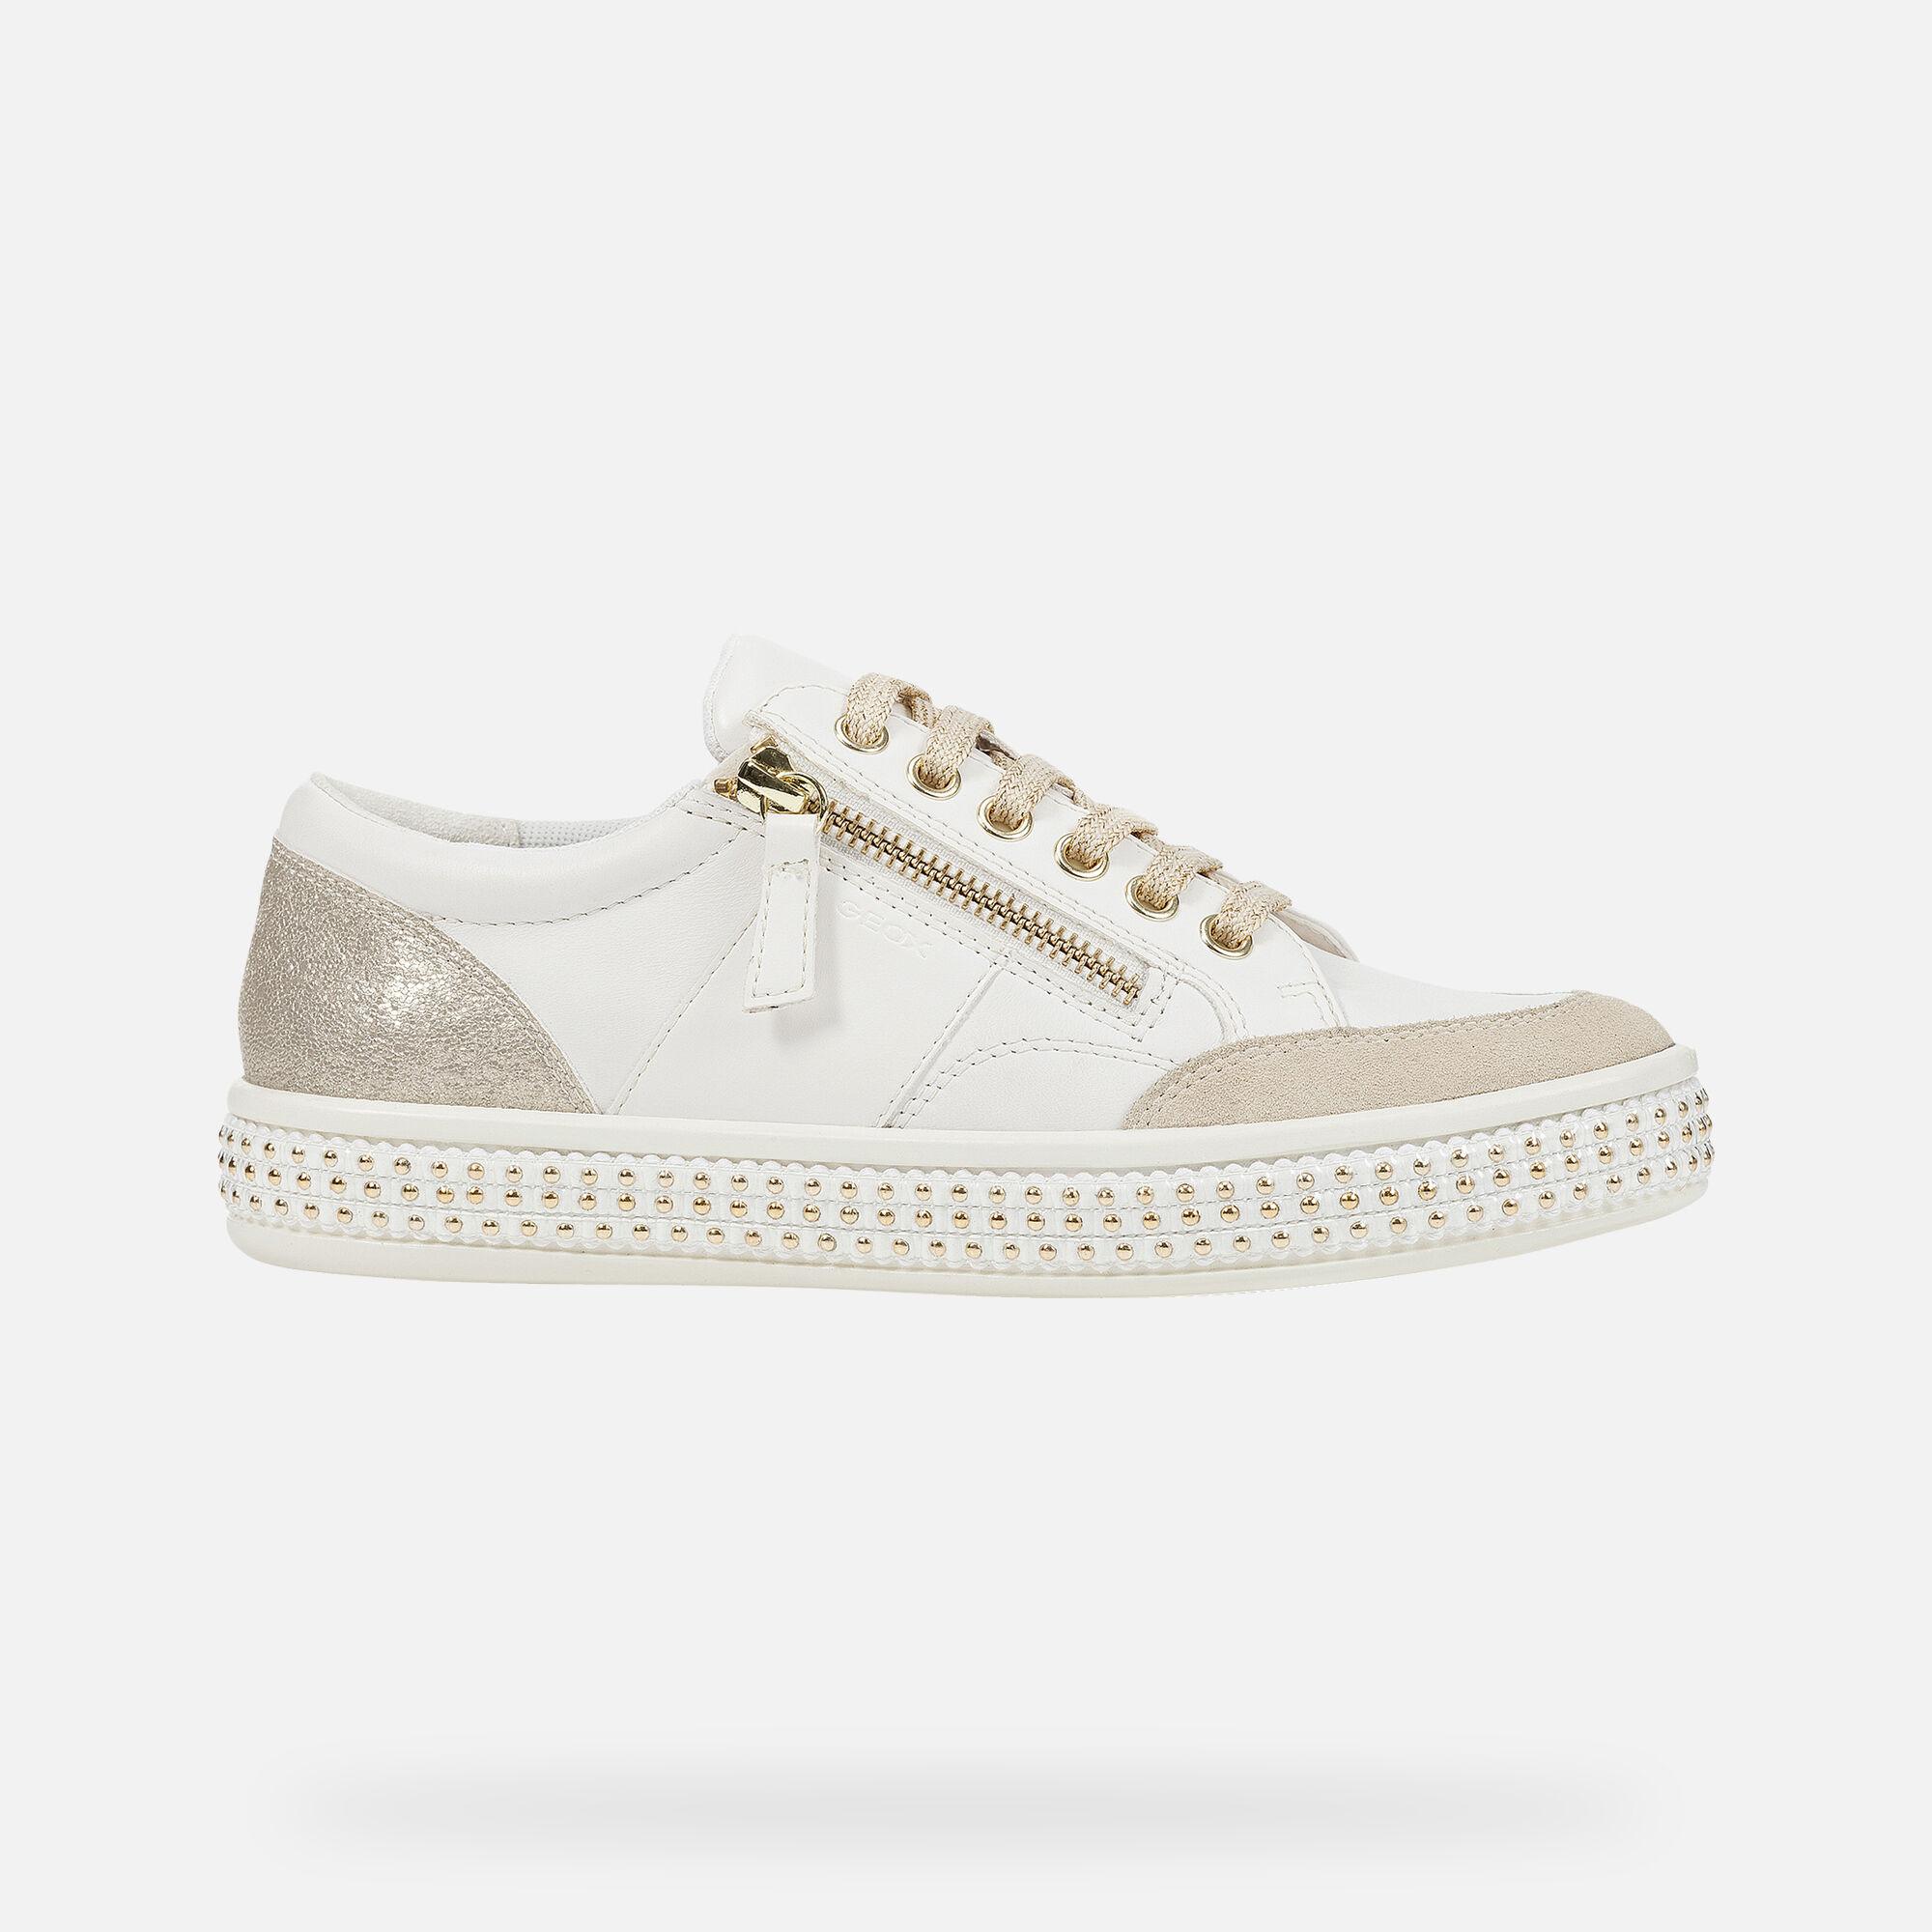 Geox LEELU' Donna: Sneakers Basse Bianche | Geox ® FW 1920